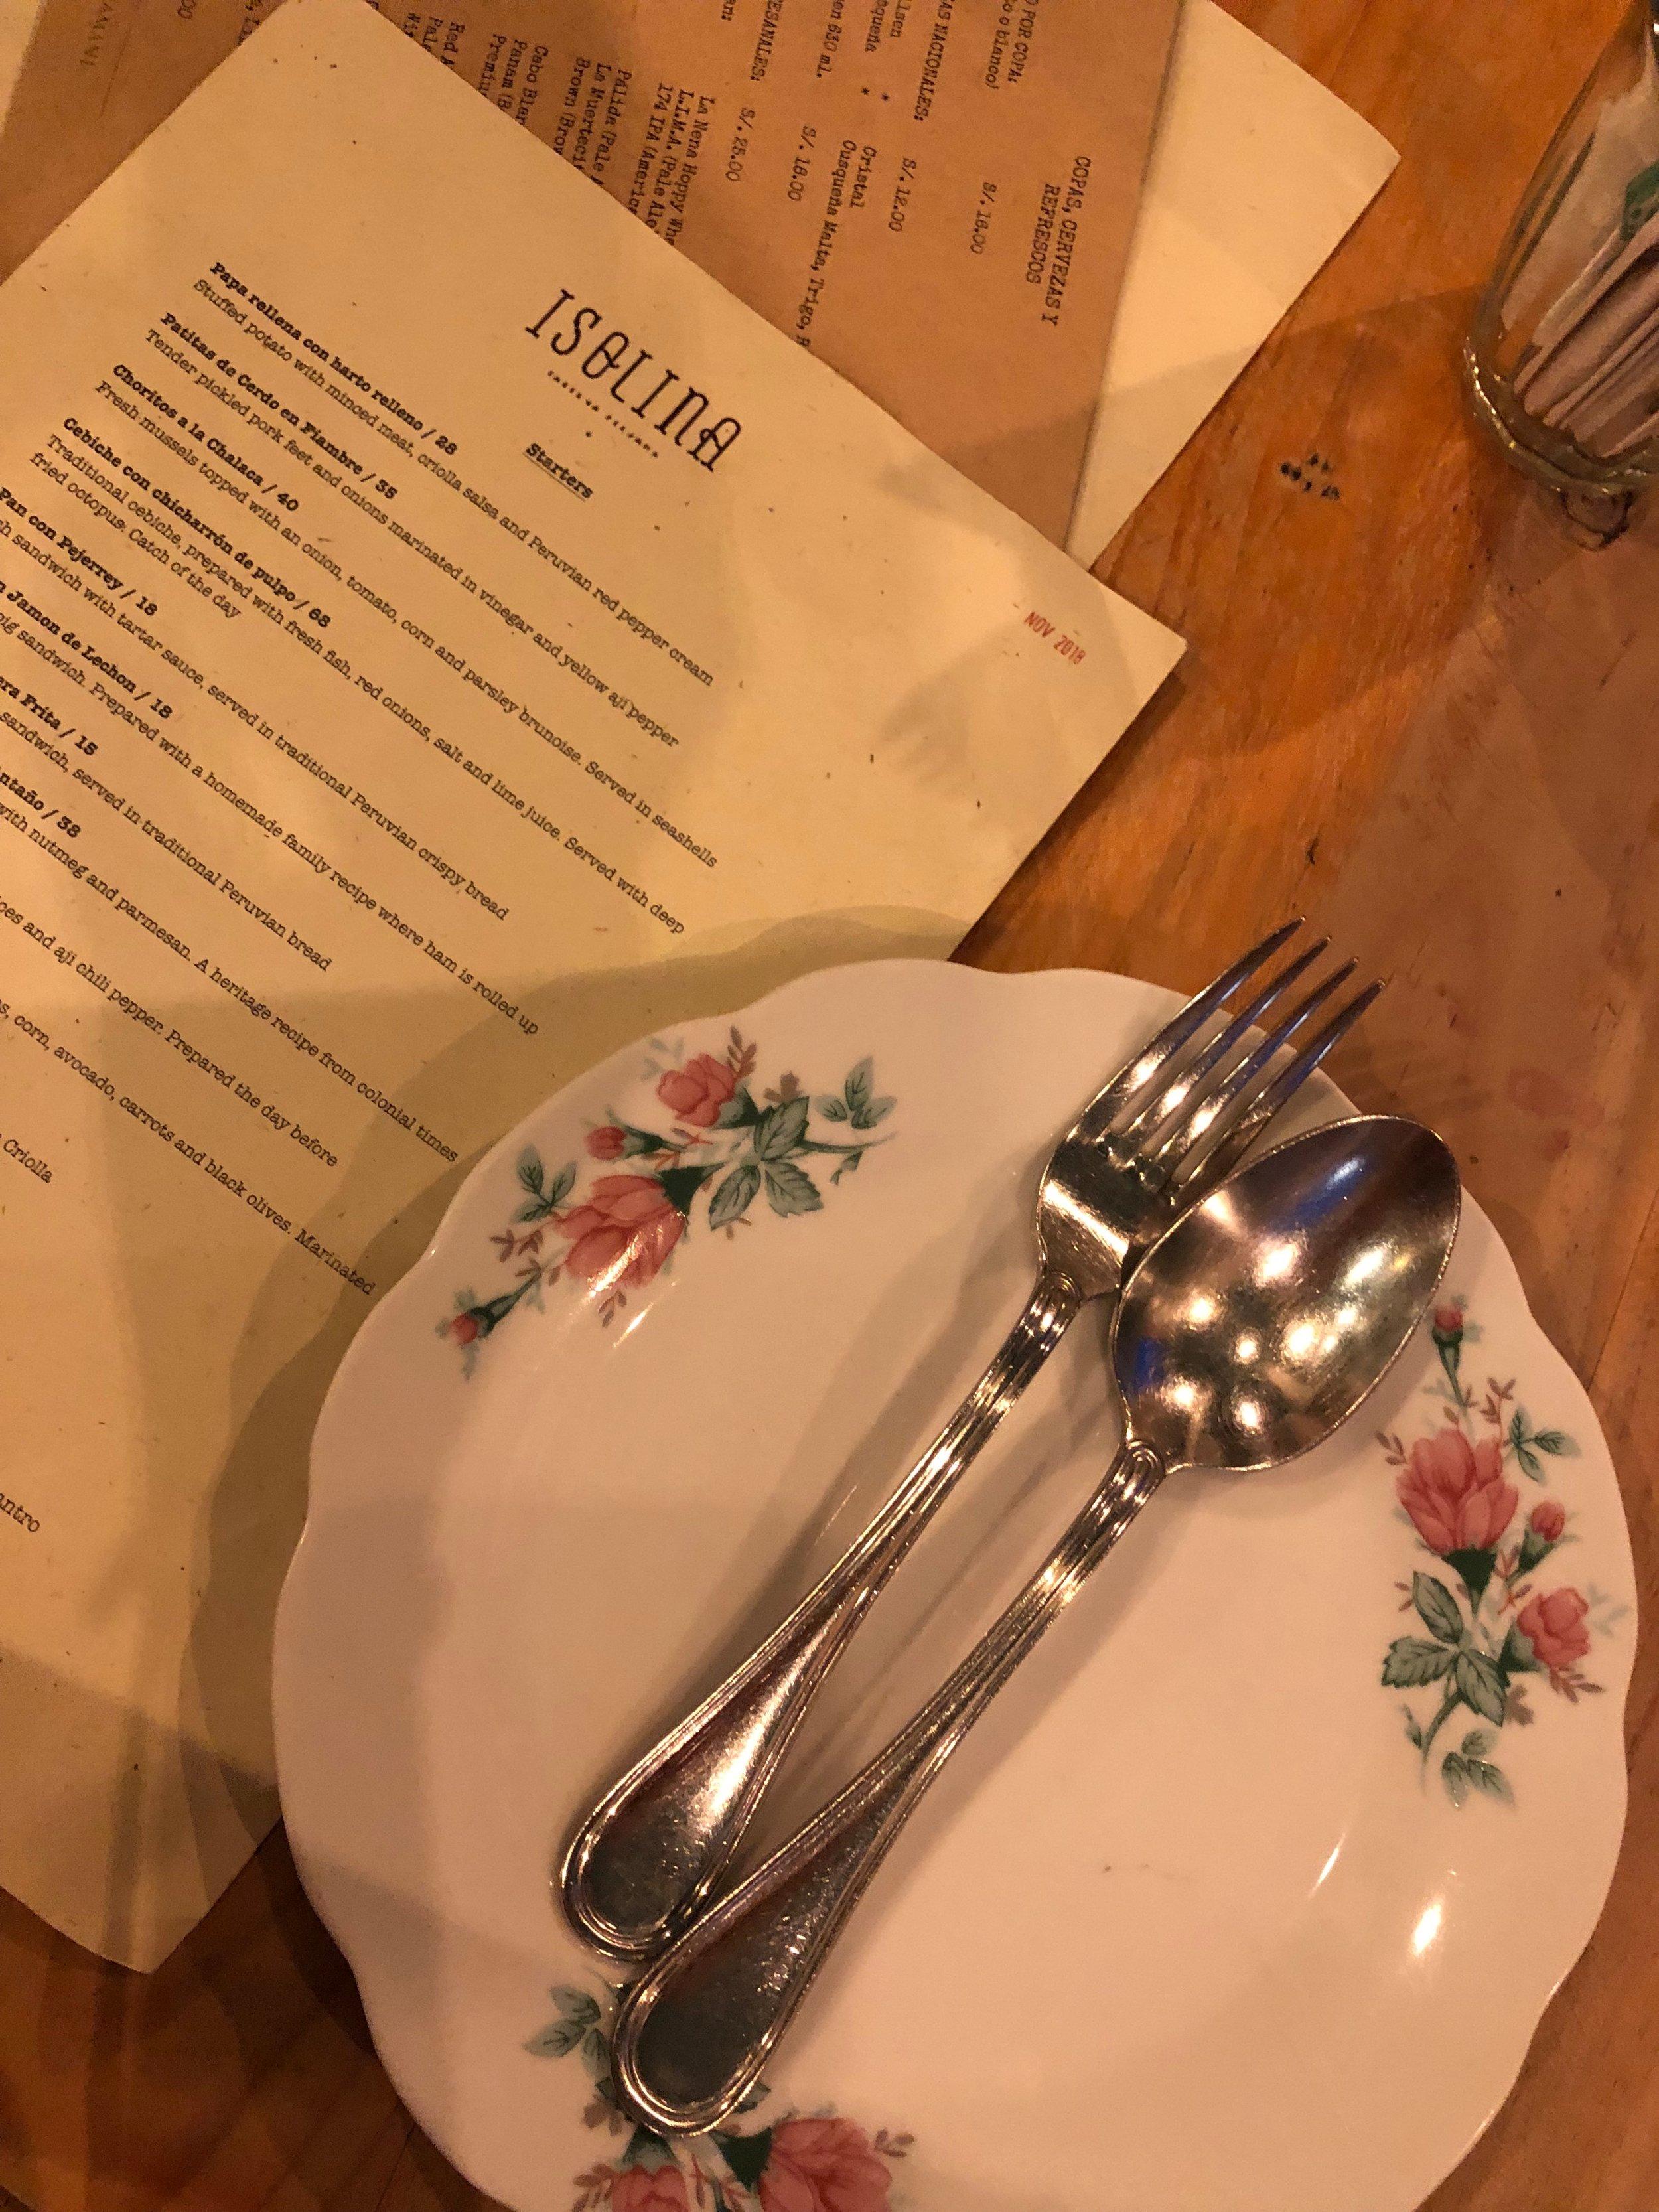 Isolina-peru-lima-barranco-food-restaurant-travel-tips